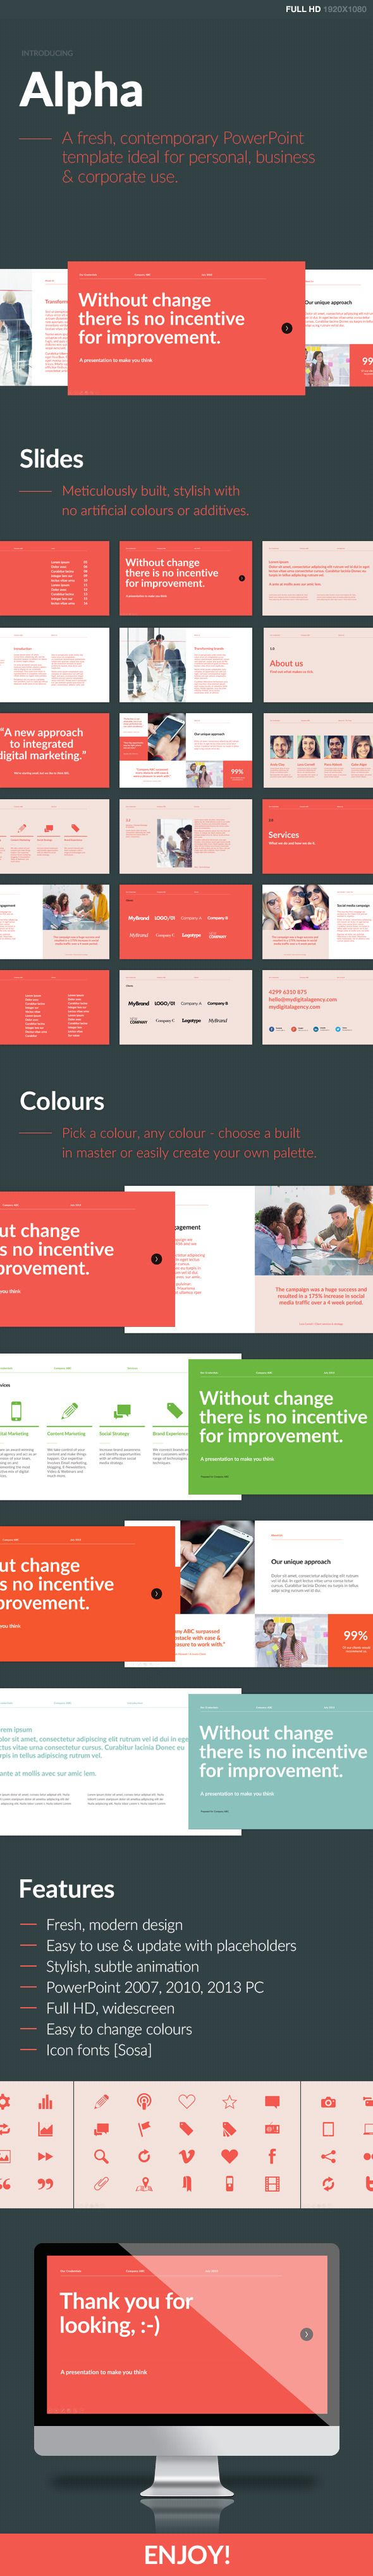 Alpha PowerPoint Template (PowerPoint Templates) #powerpoint